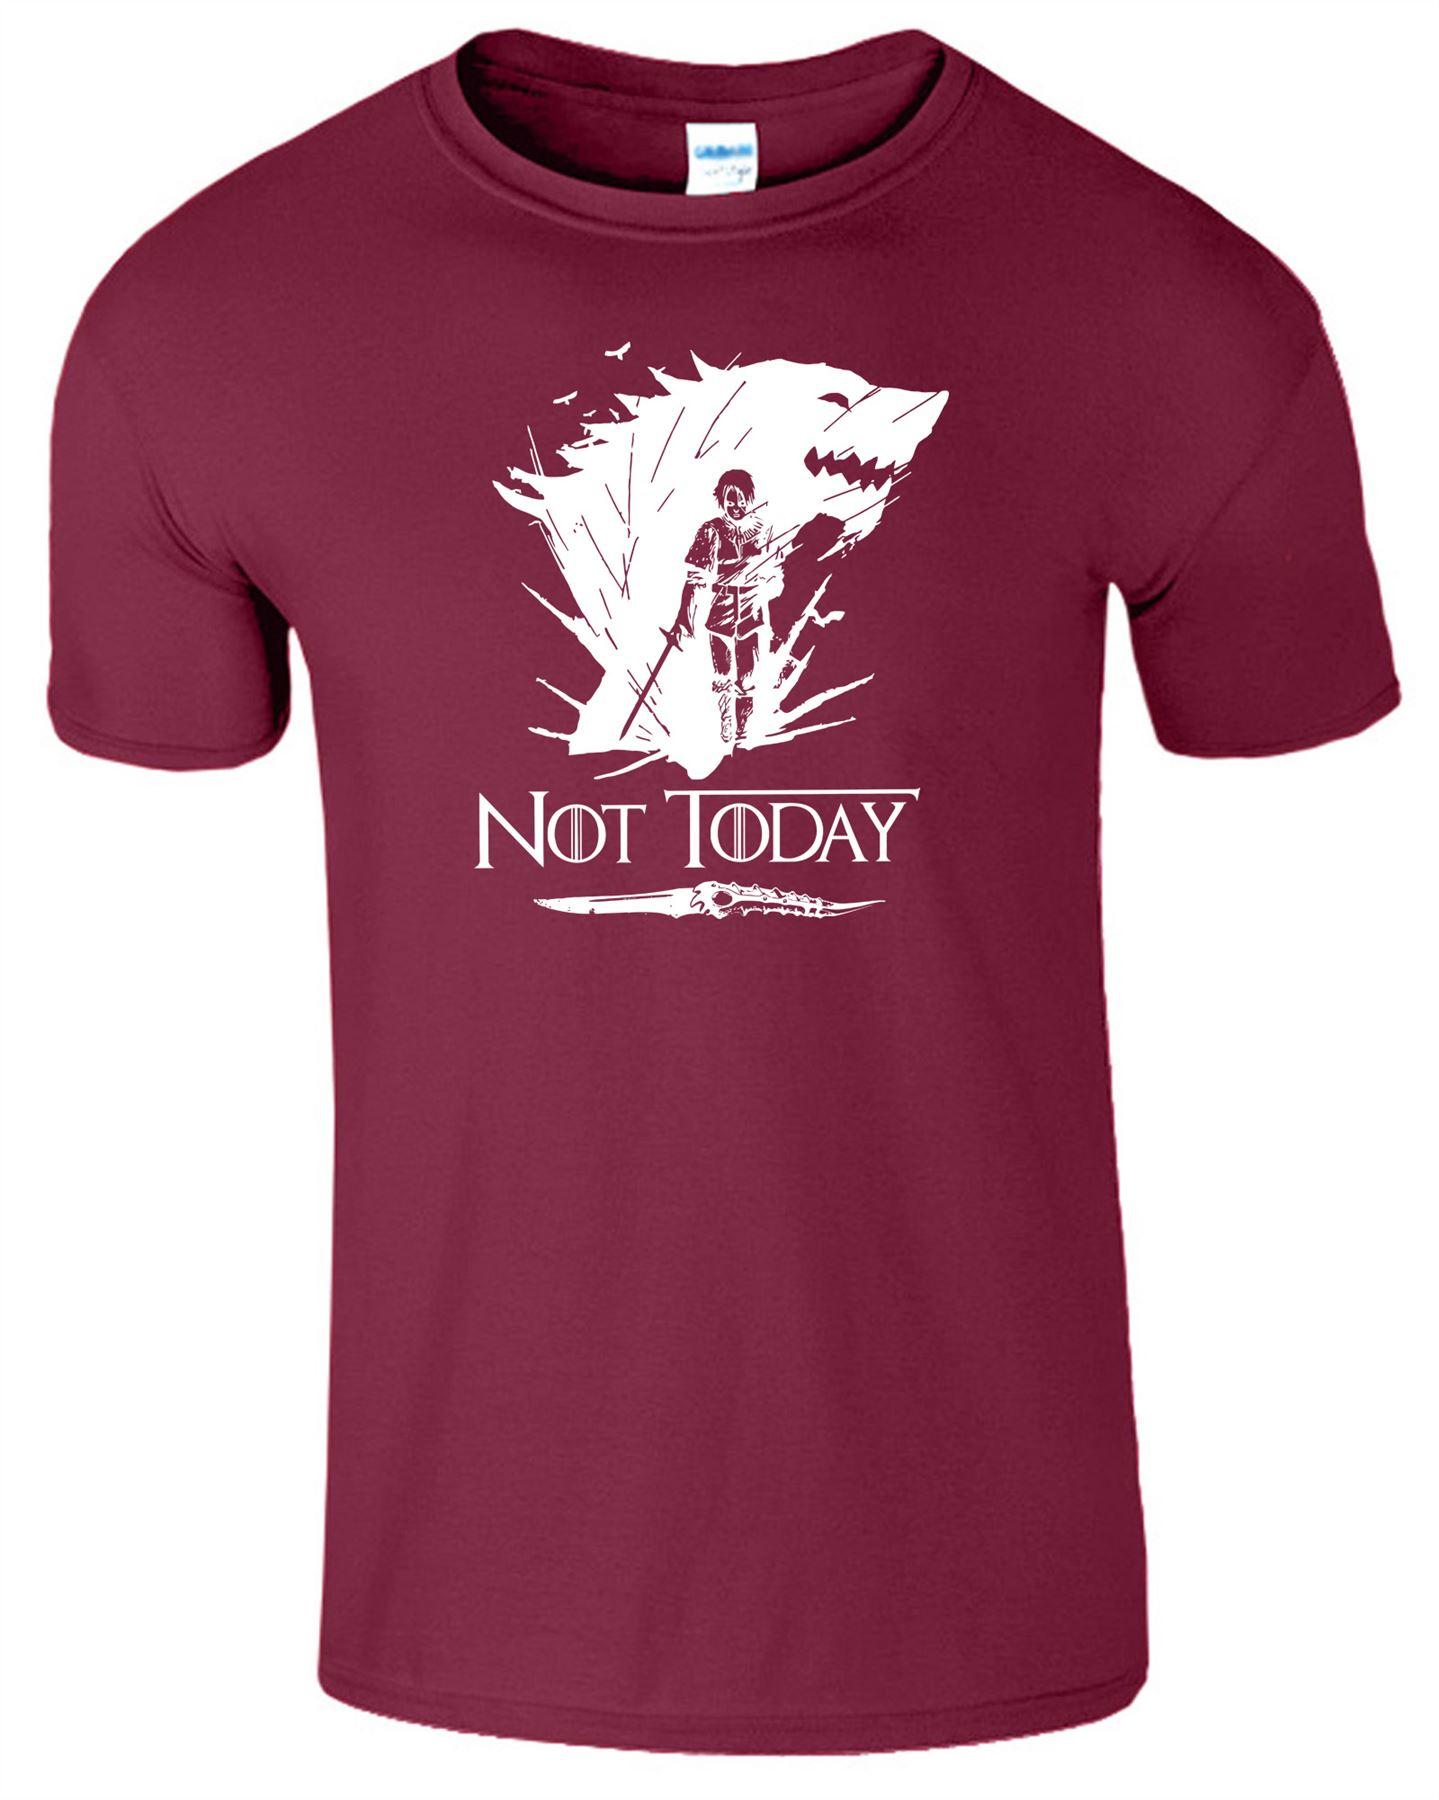 Arya-Stark-Not-Today-T-Shirt-Mens-Game-Season-Womens-Shirt-Adults-Unisex-Fit Indexbild 30